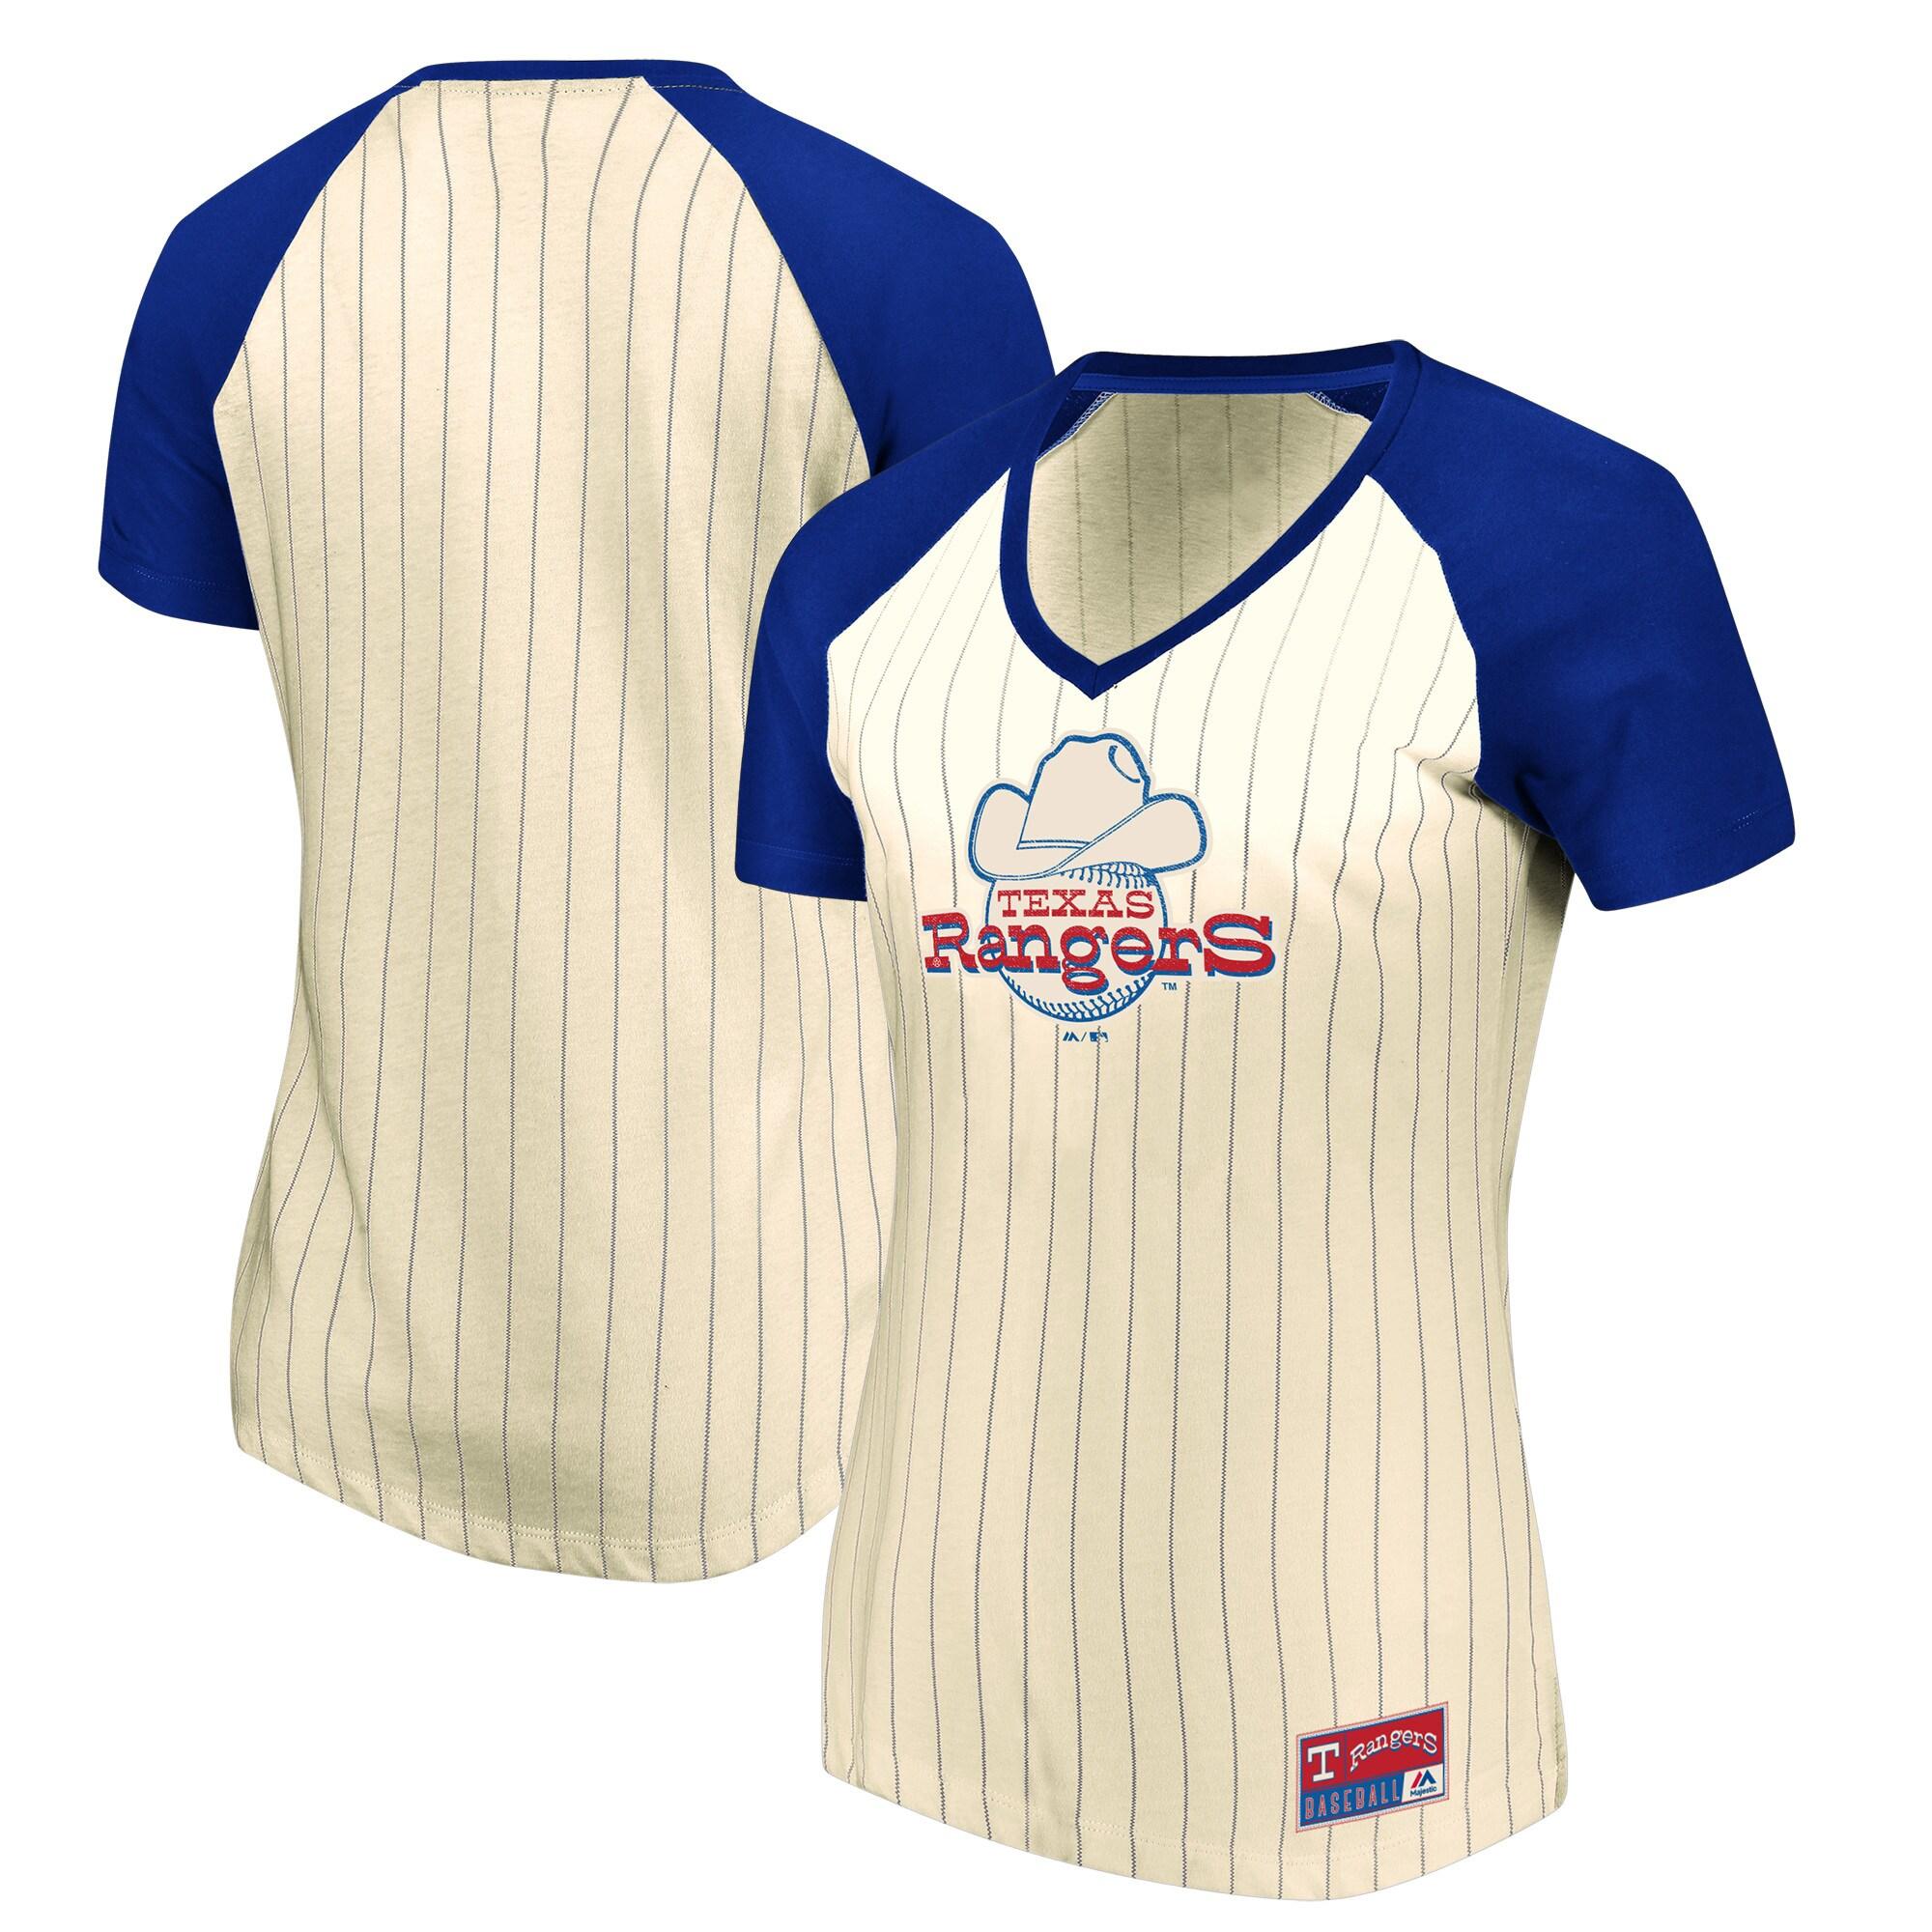 Texas Rangers Majestic Women's Concept of Winning Pinstripe V-Neck Raglan T-Shirt - Natural